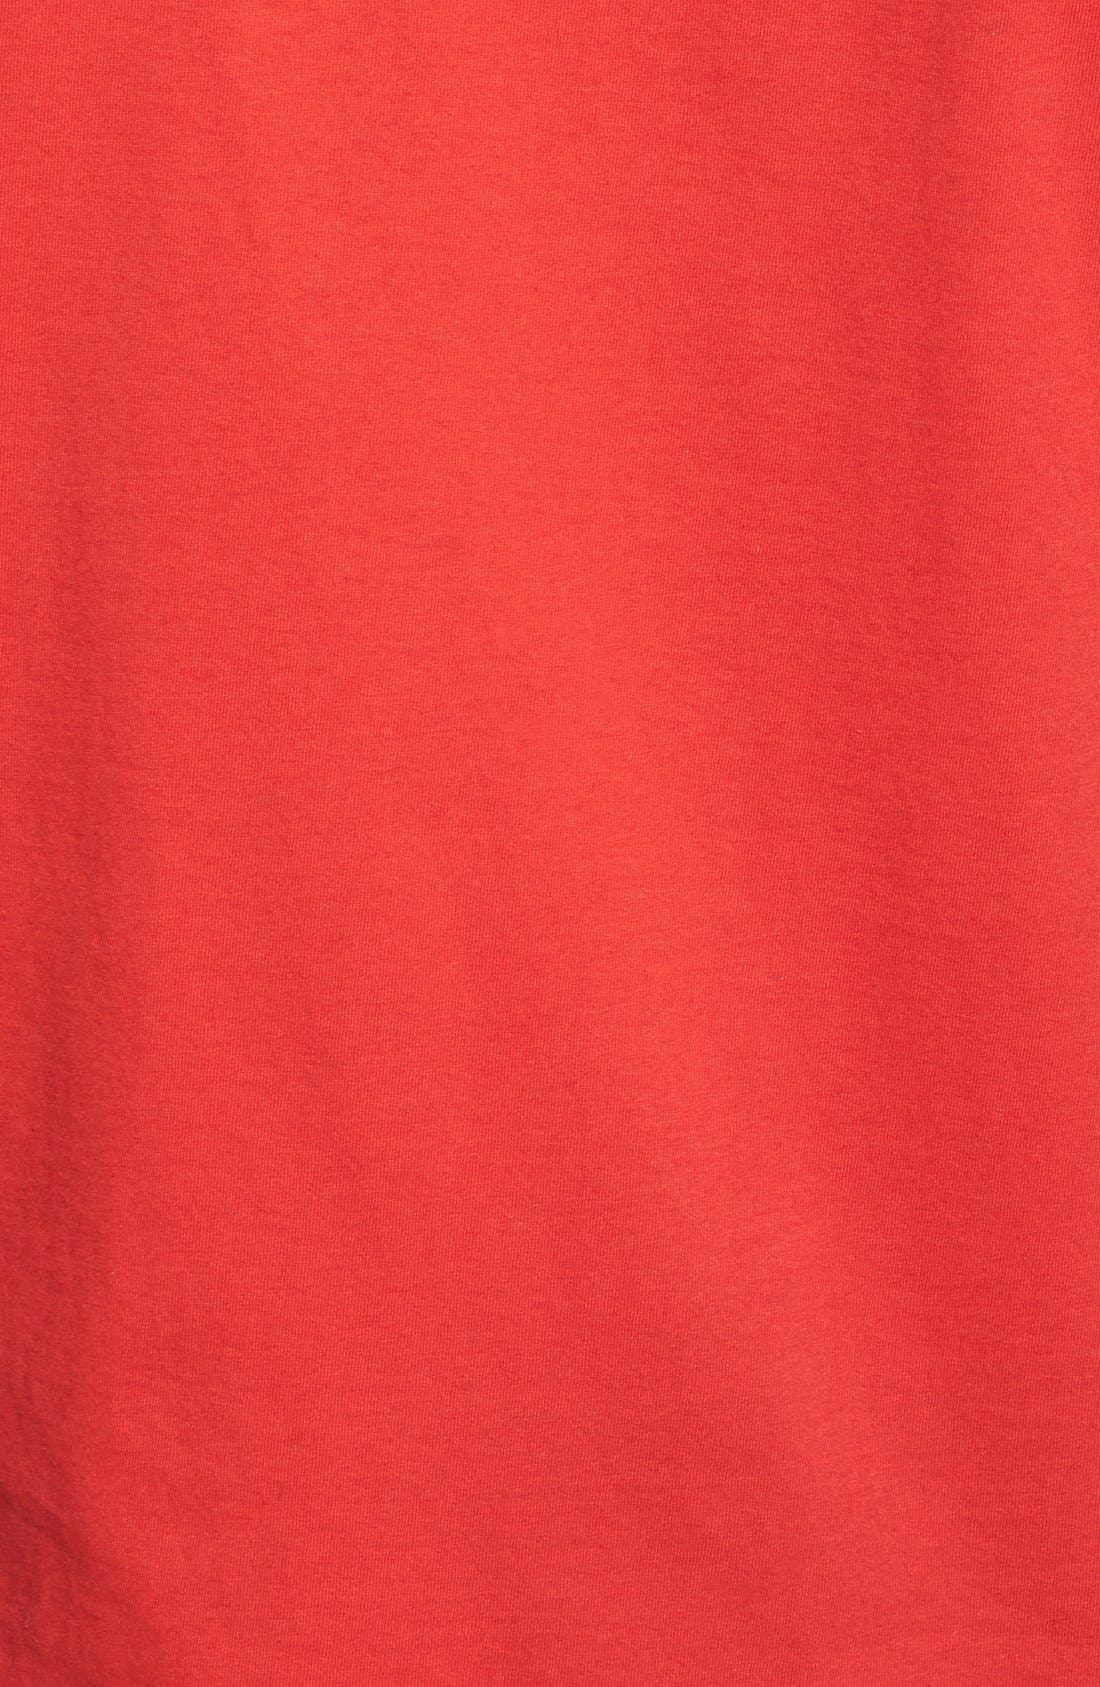 Alternate Image 3  - Topman 'Alright' Jersey T-Shirt (Brit Pop-In) (Nordstrom Exclusive)